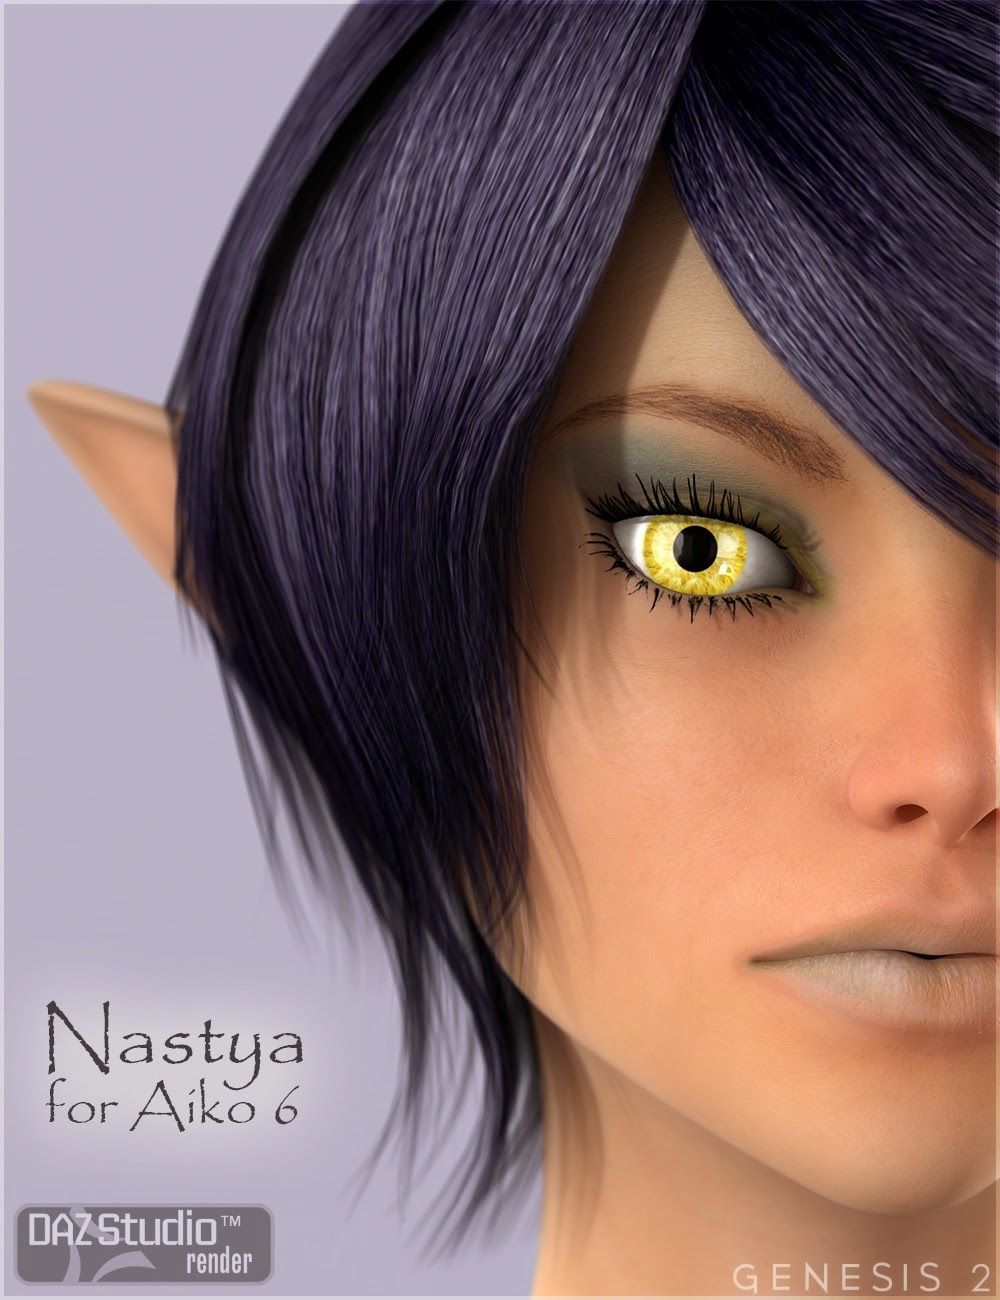 3d Models - Nastya for Aiko 6